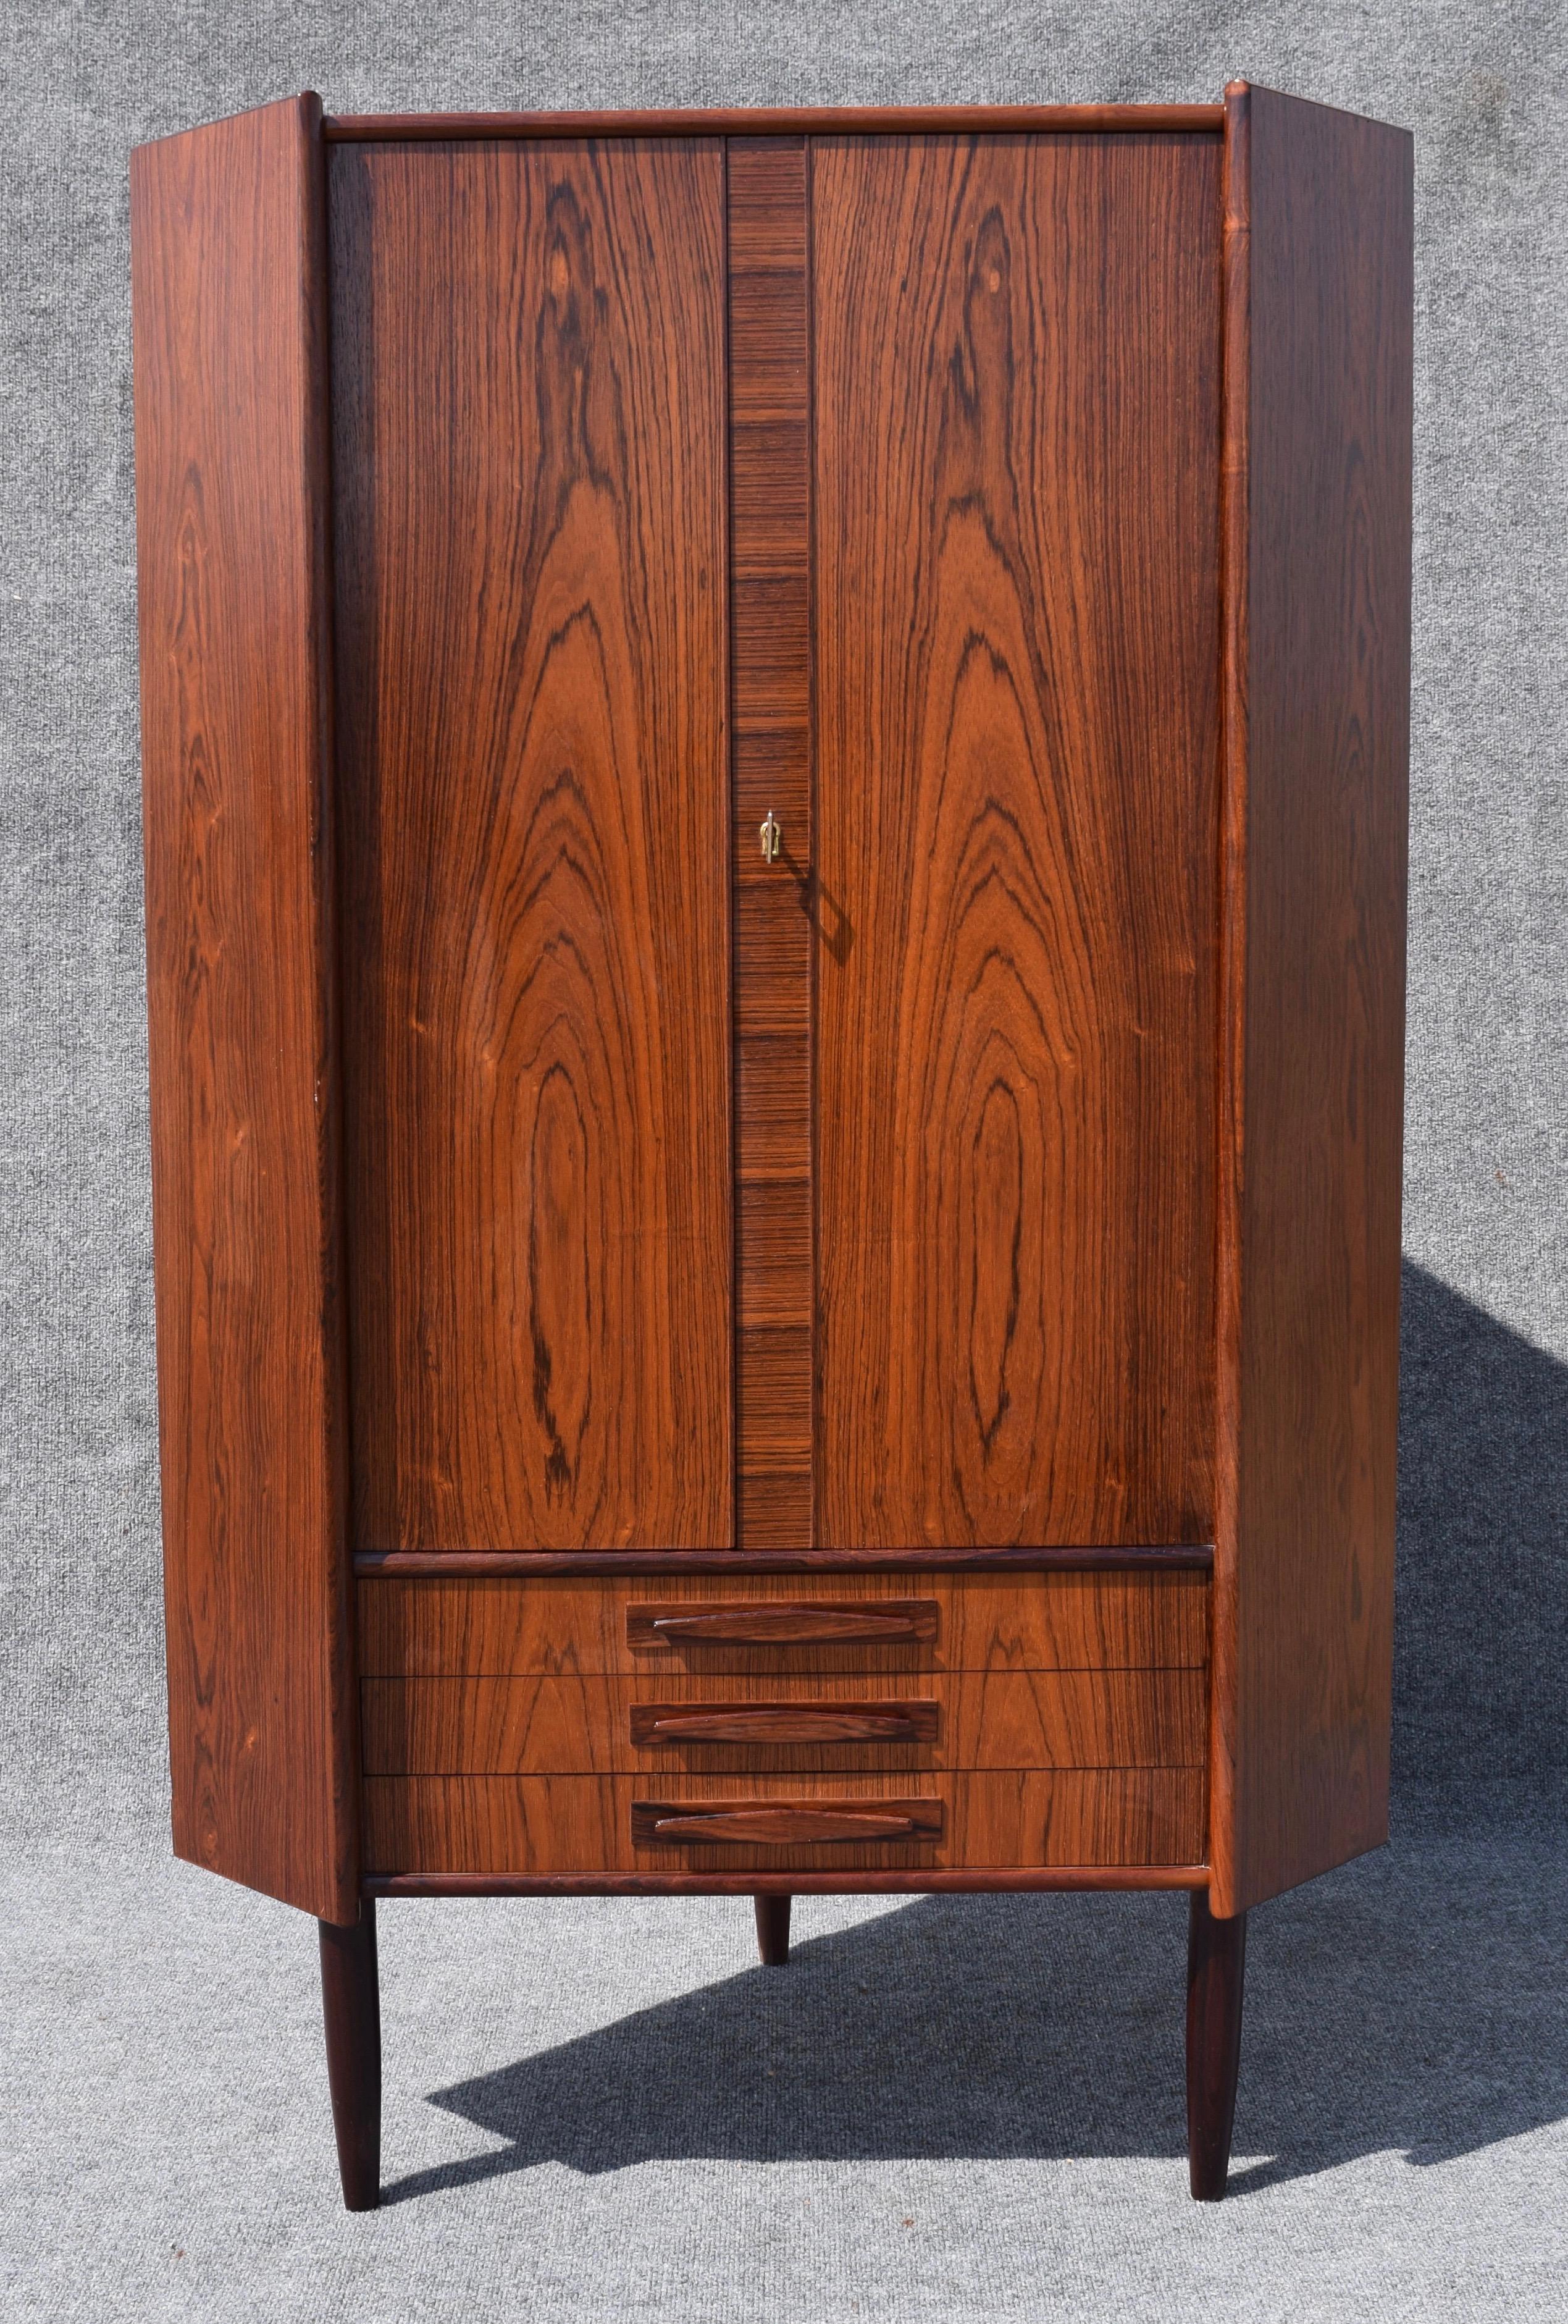 Awesome Vintage Danish Mid Century Modern Rosewood Corner Cabinet   Image 4 Of 8